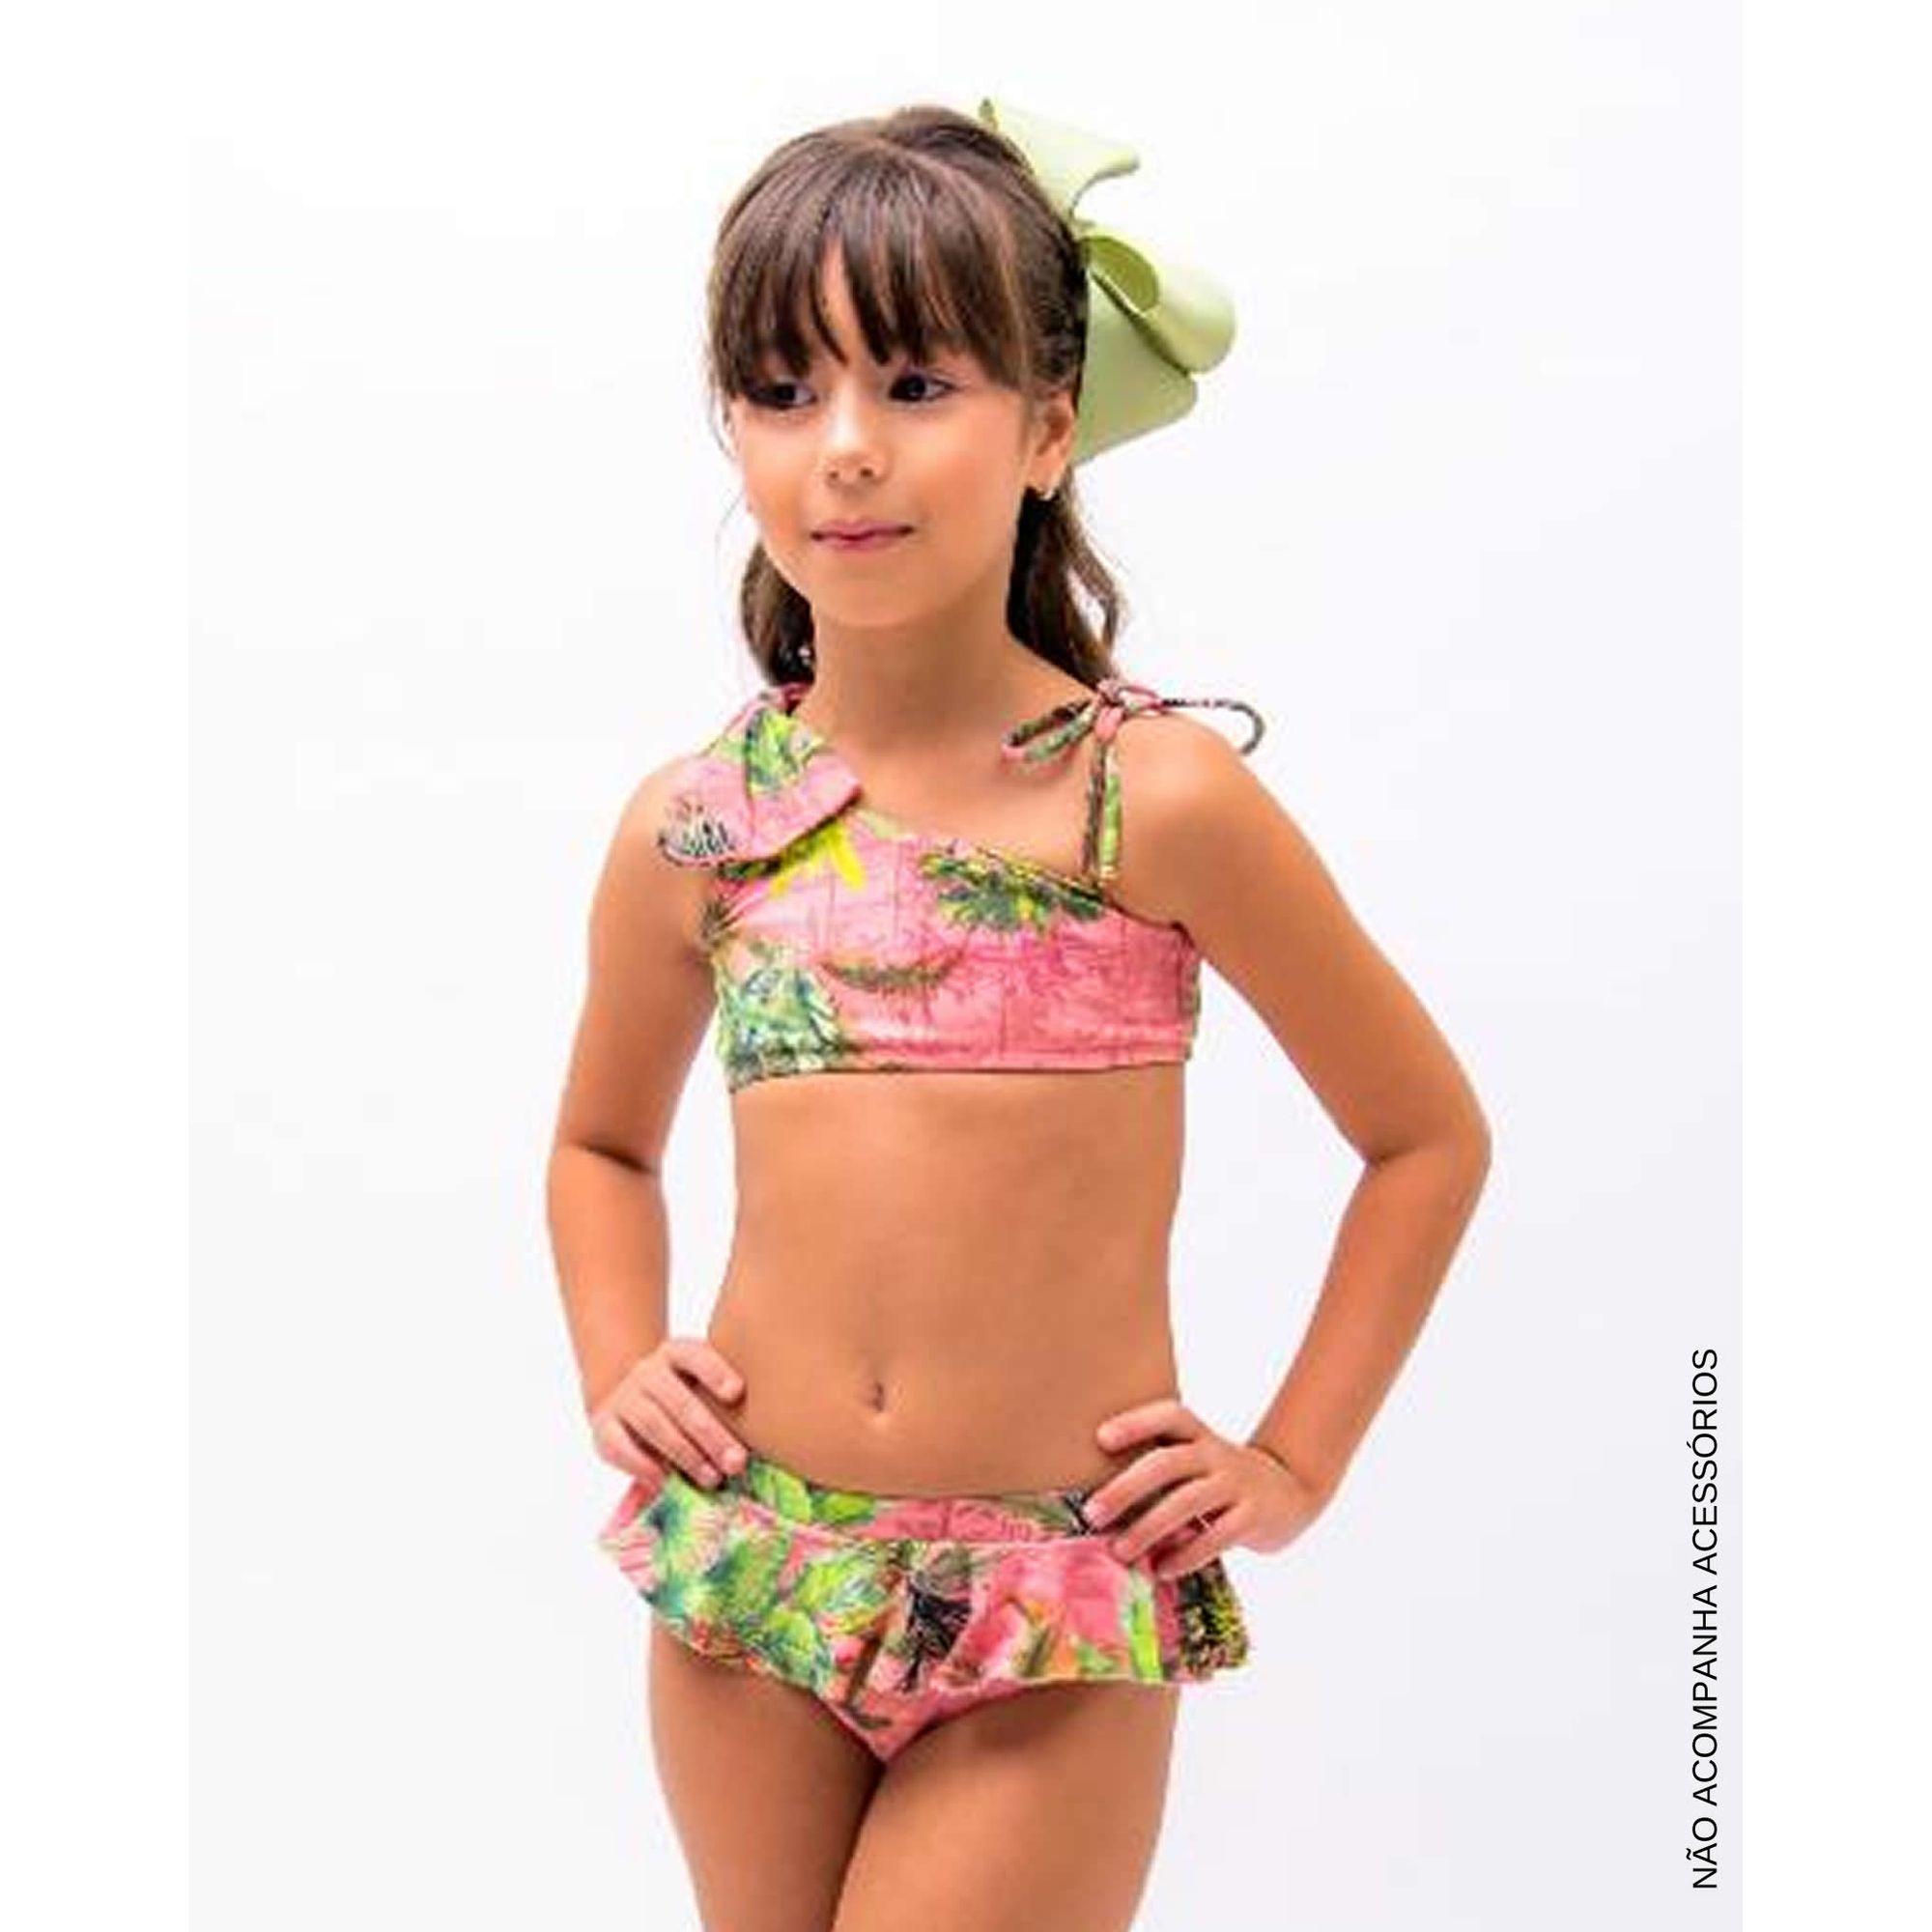 biquini-infantil-goiaba-e-folhas-verder-laco-ombro-1